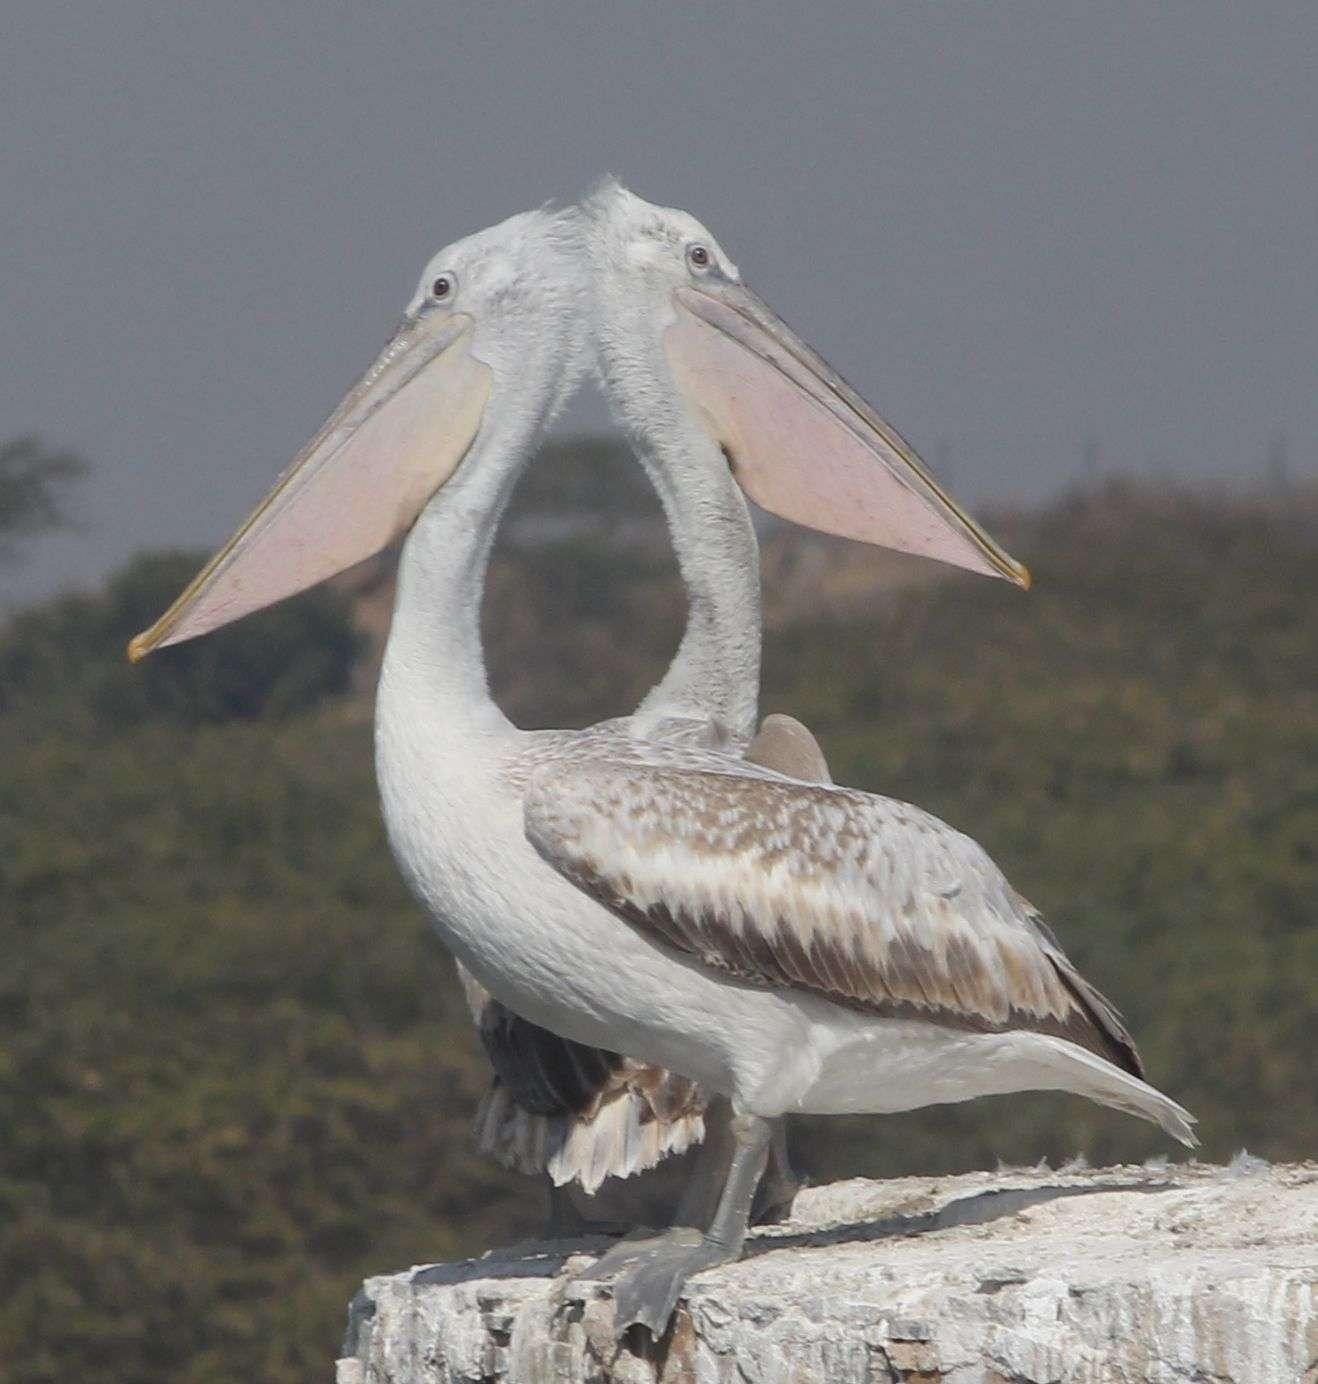 beautiful pics of birds